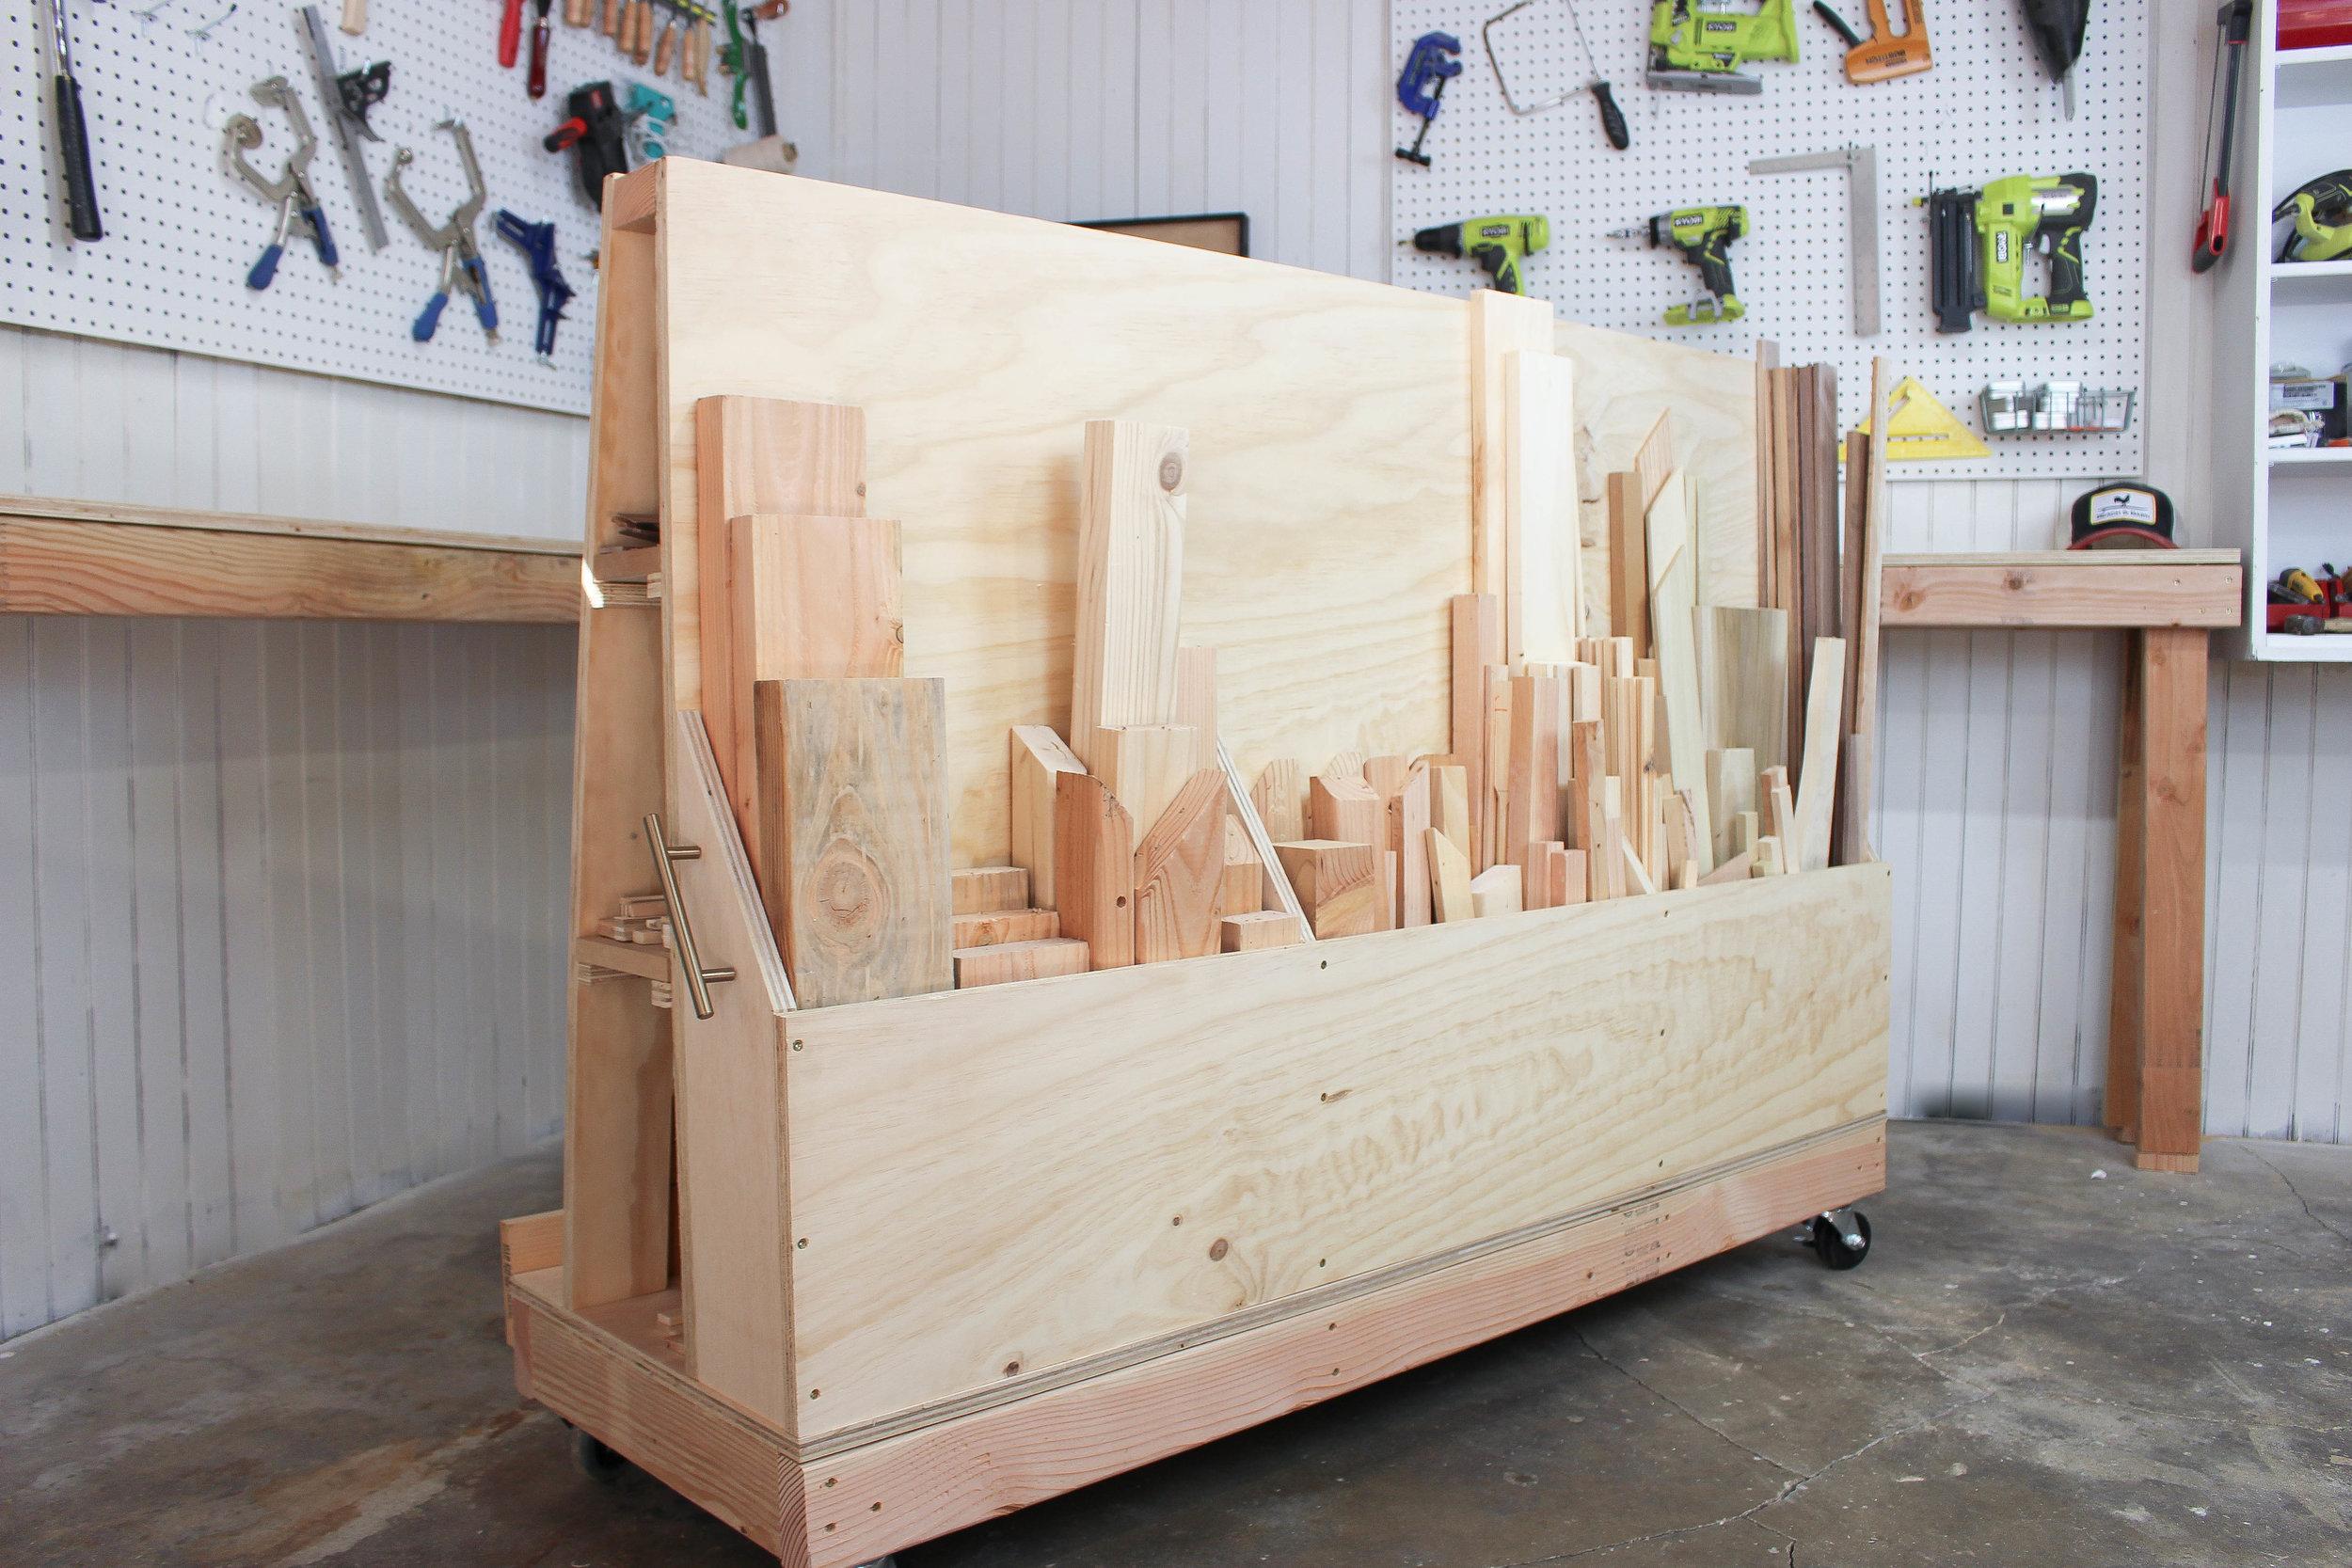 3x3CUSTOM Scrap Wood Storage Cart